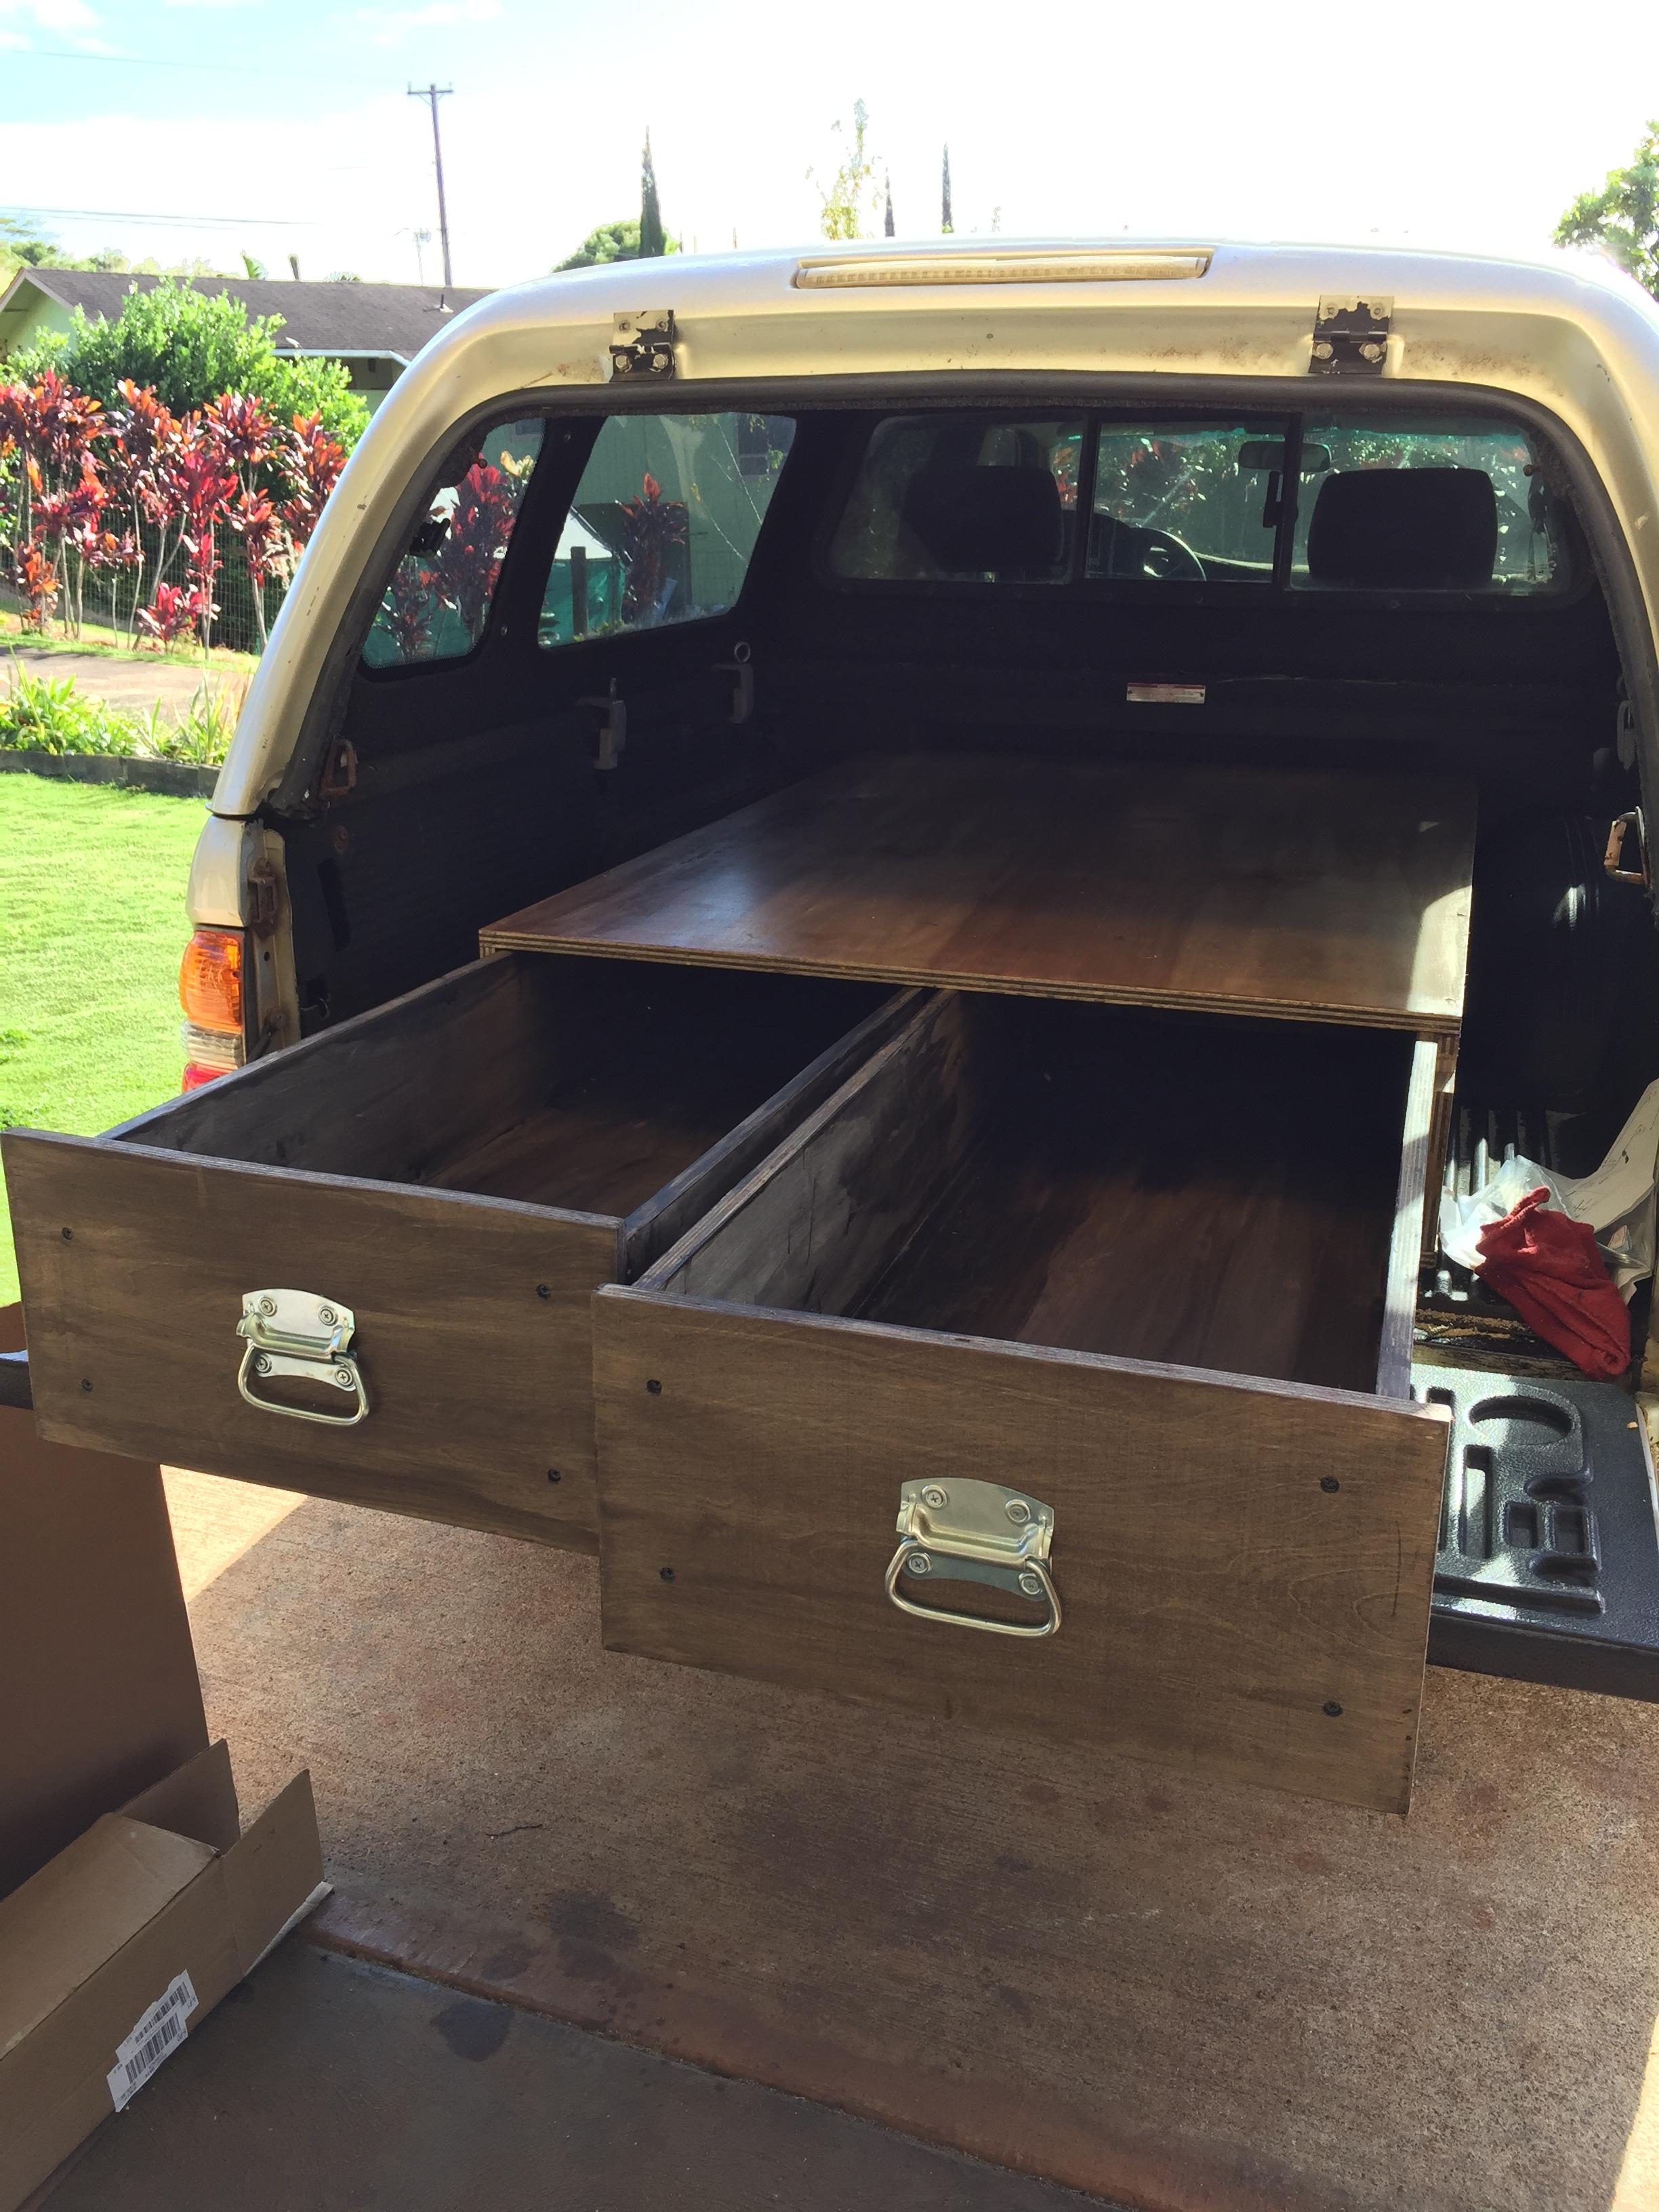 kauai overlander-toyota tacoma-camper-storage-4wd-roof top tent-tepui 5.JPG